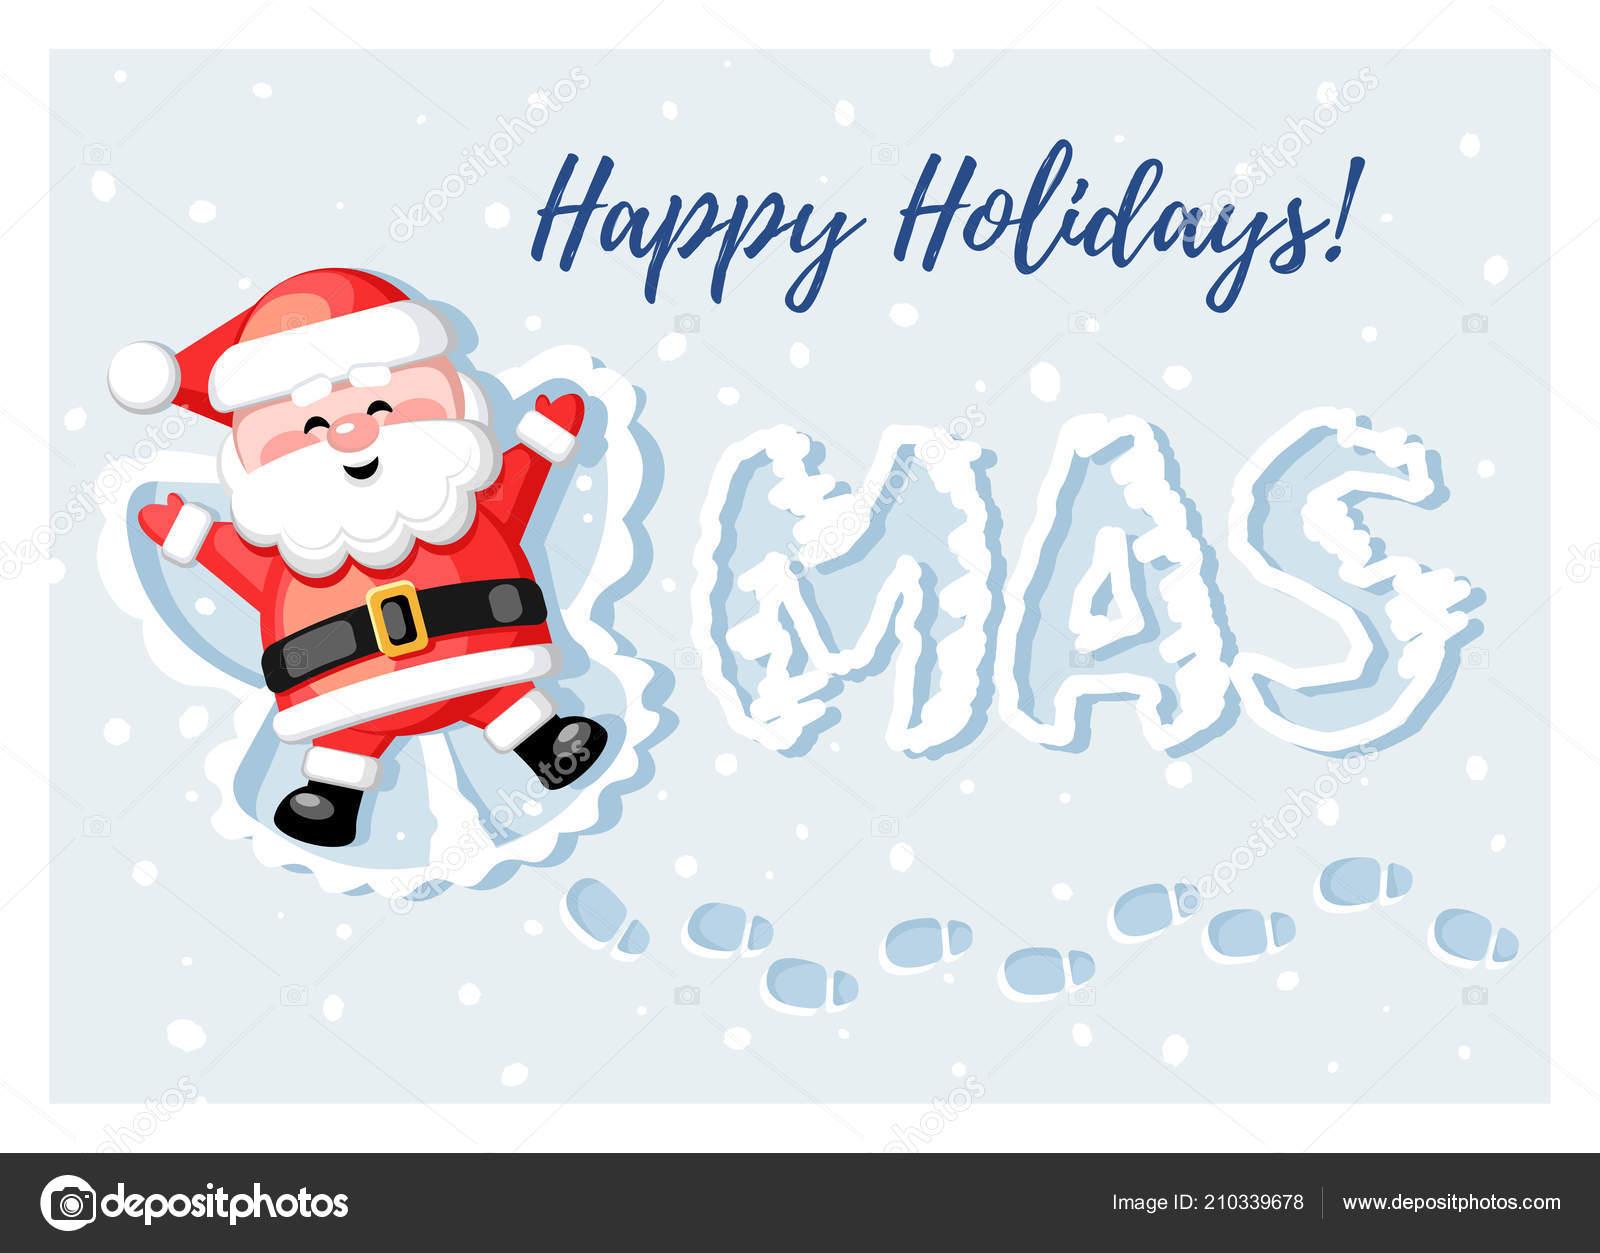 Merry Christmas Santa Claus Gift Present Christmas Snow